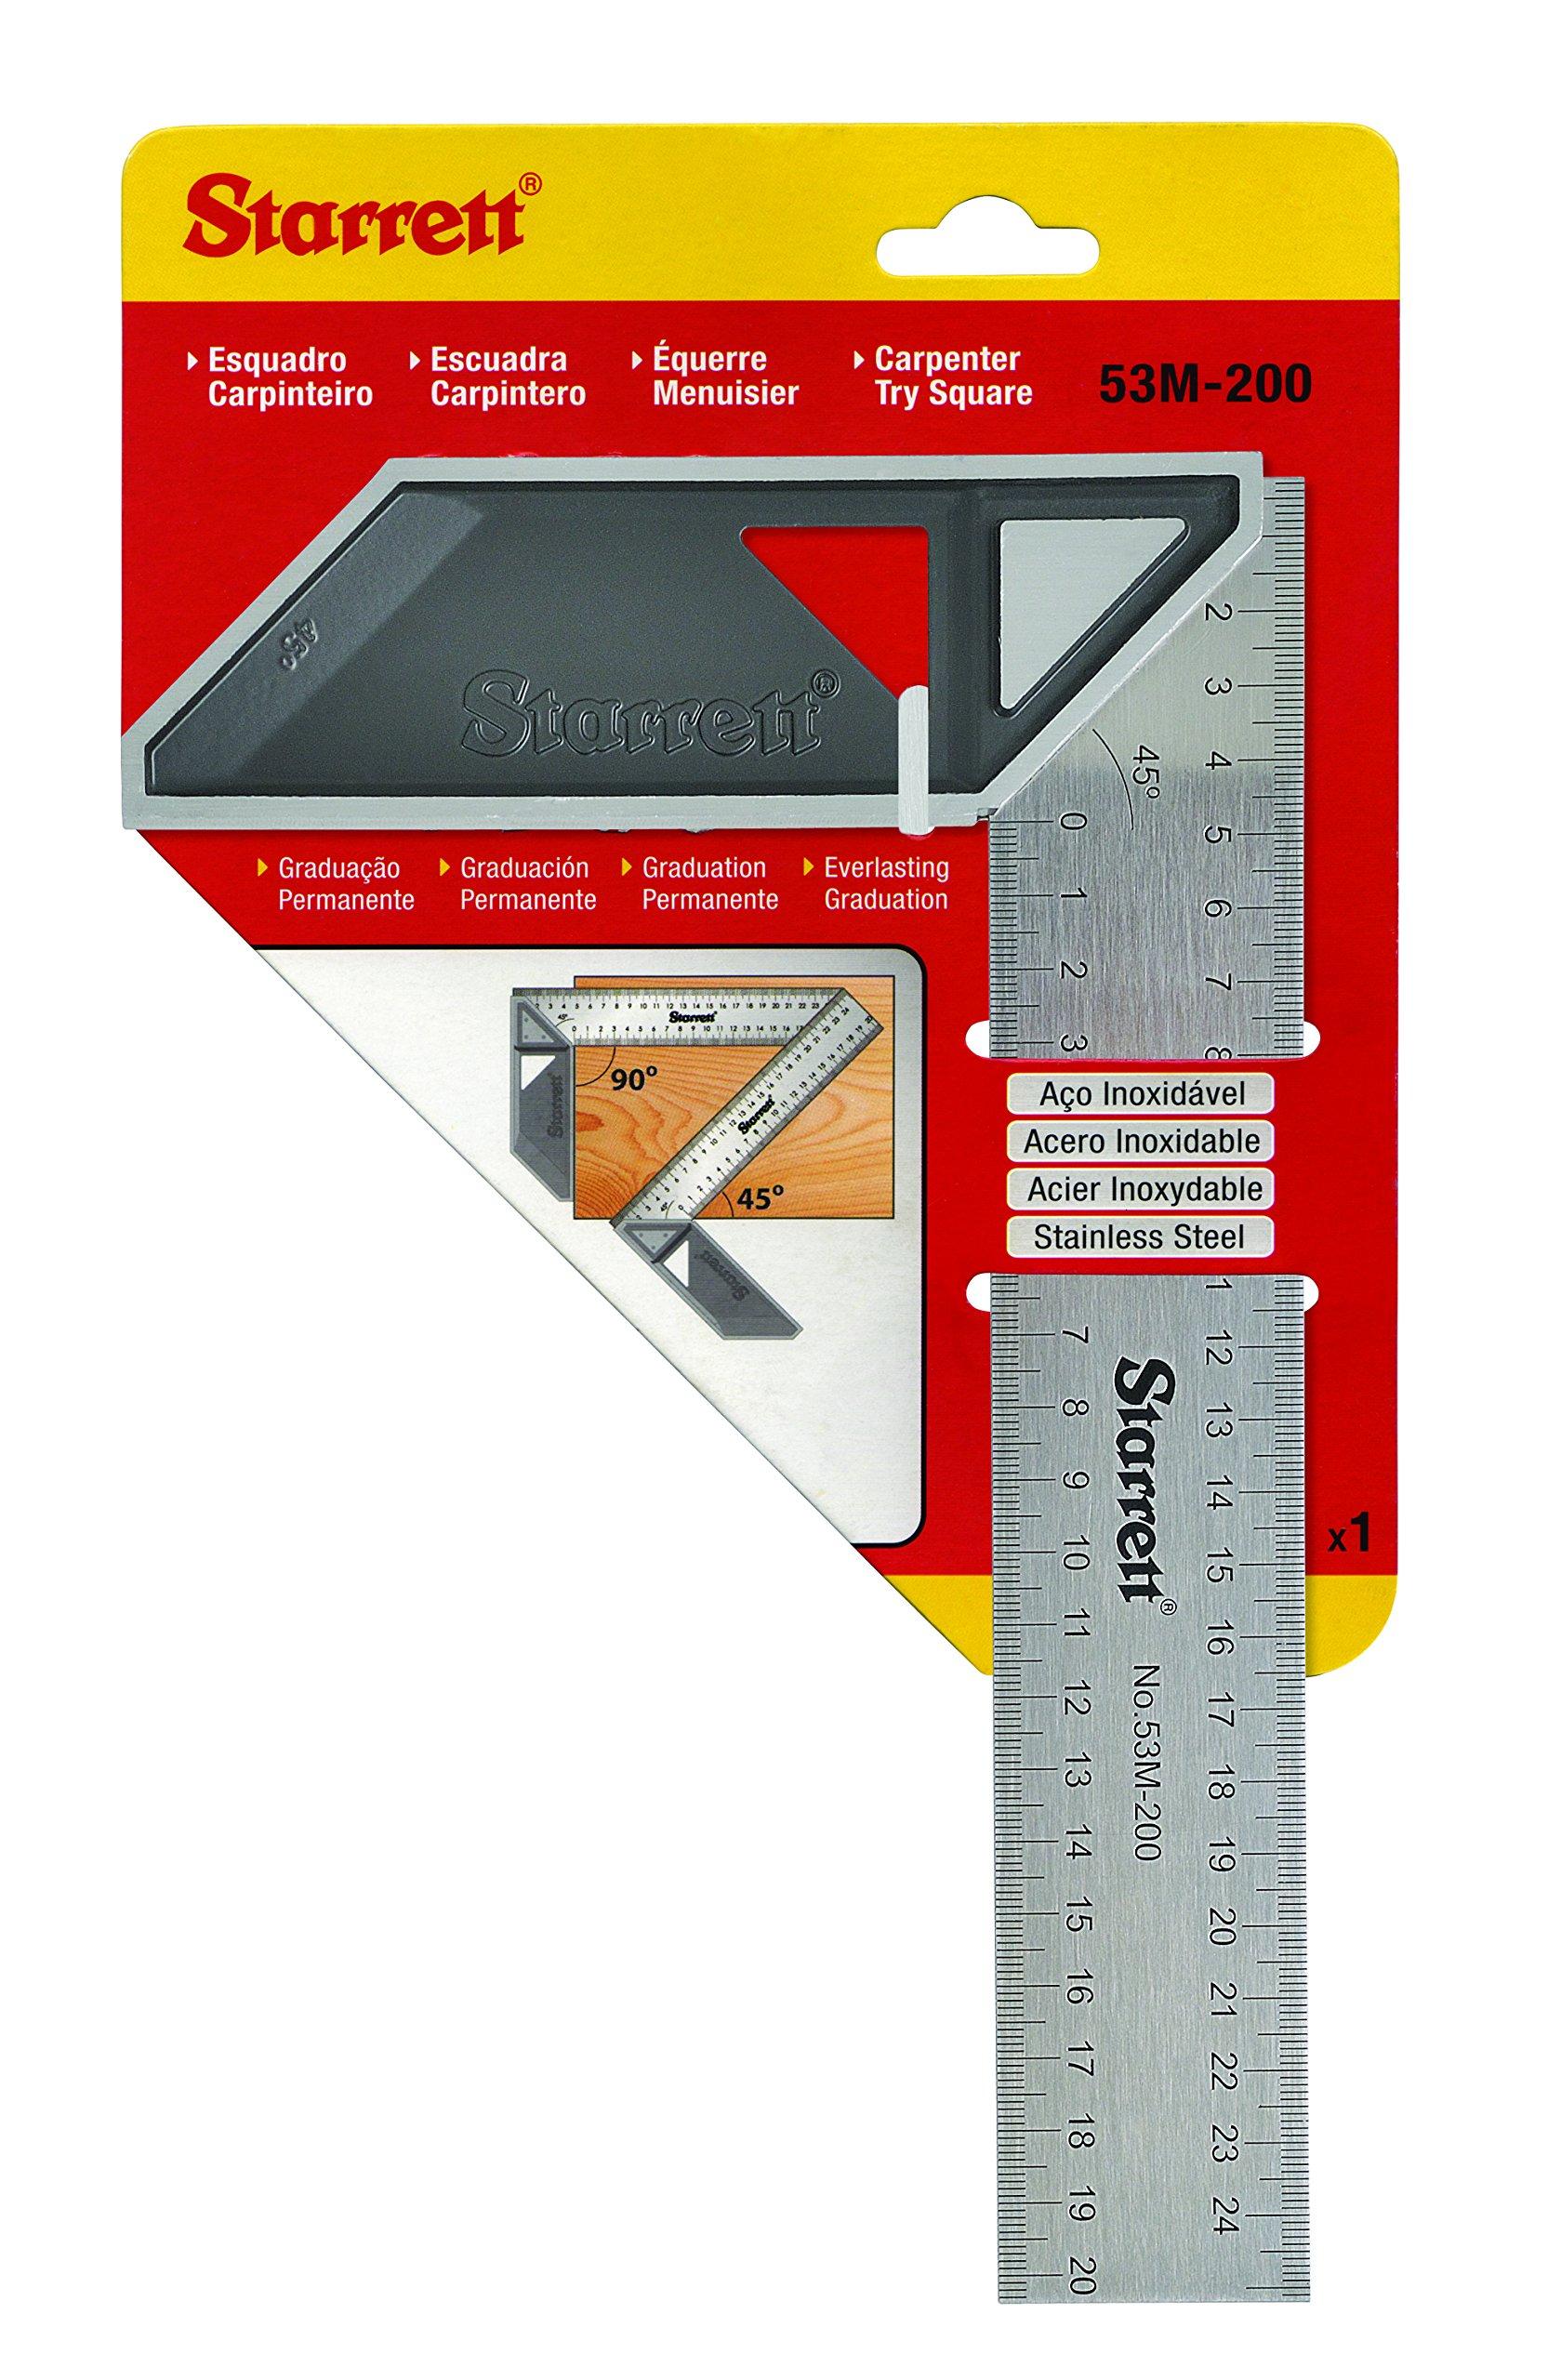 Starrett K53M-200-S Try Square